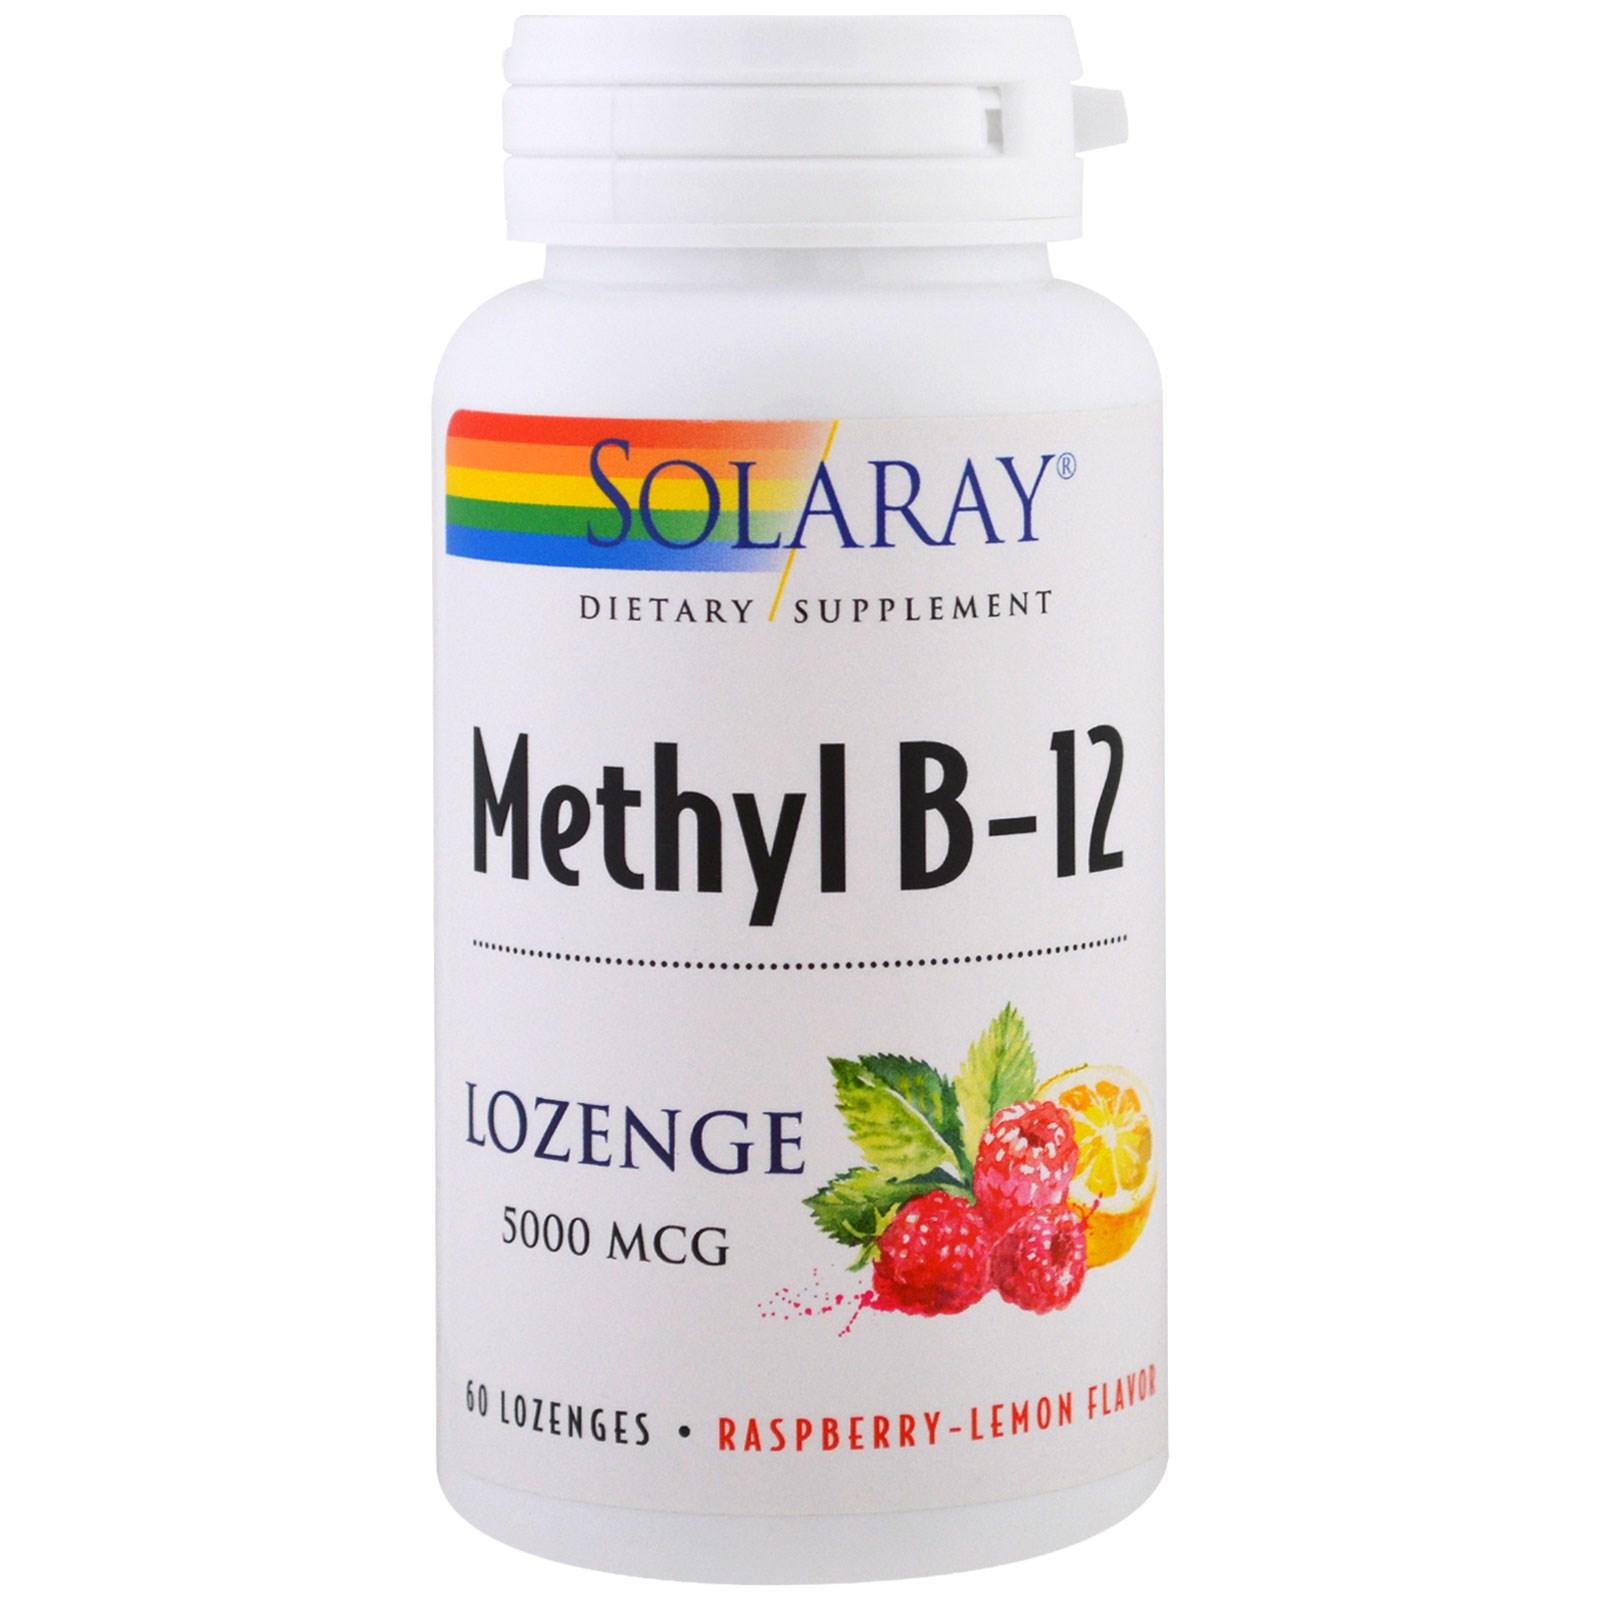 Solaray, Метил B-12, малина-лимон, 5000 мкг, 60 леденцов